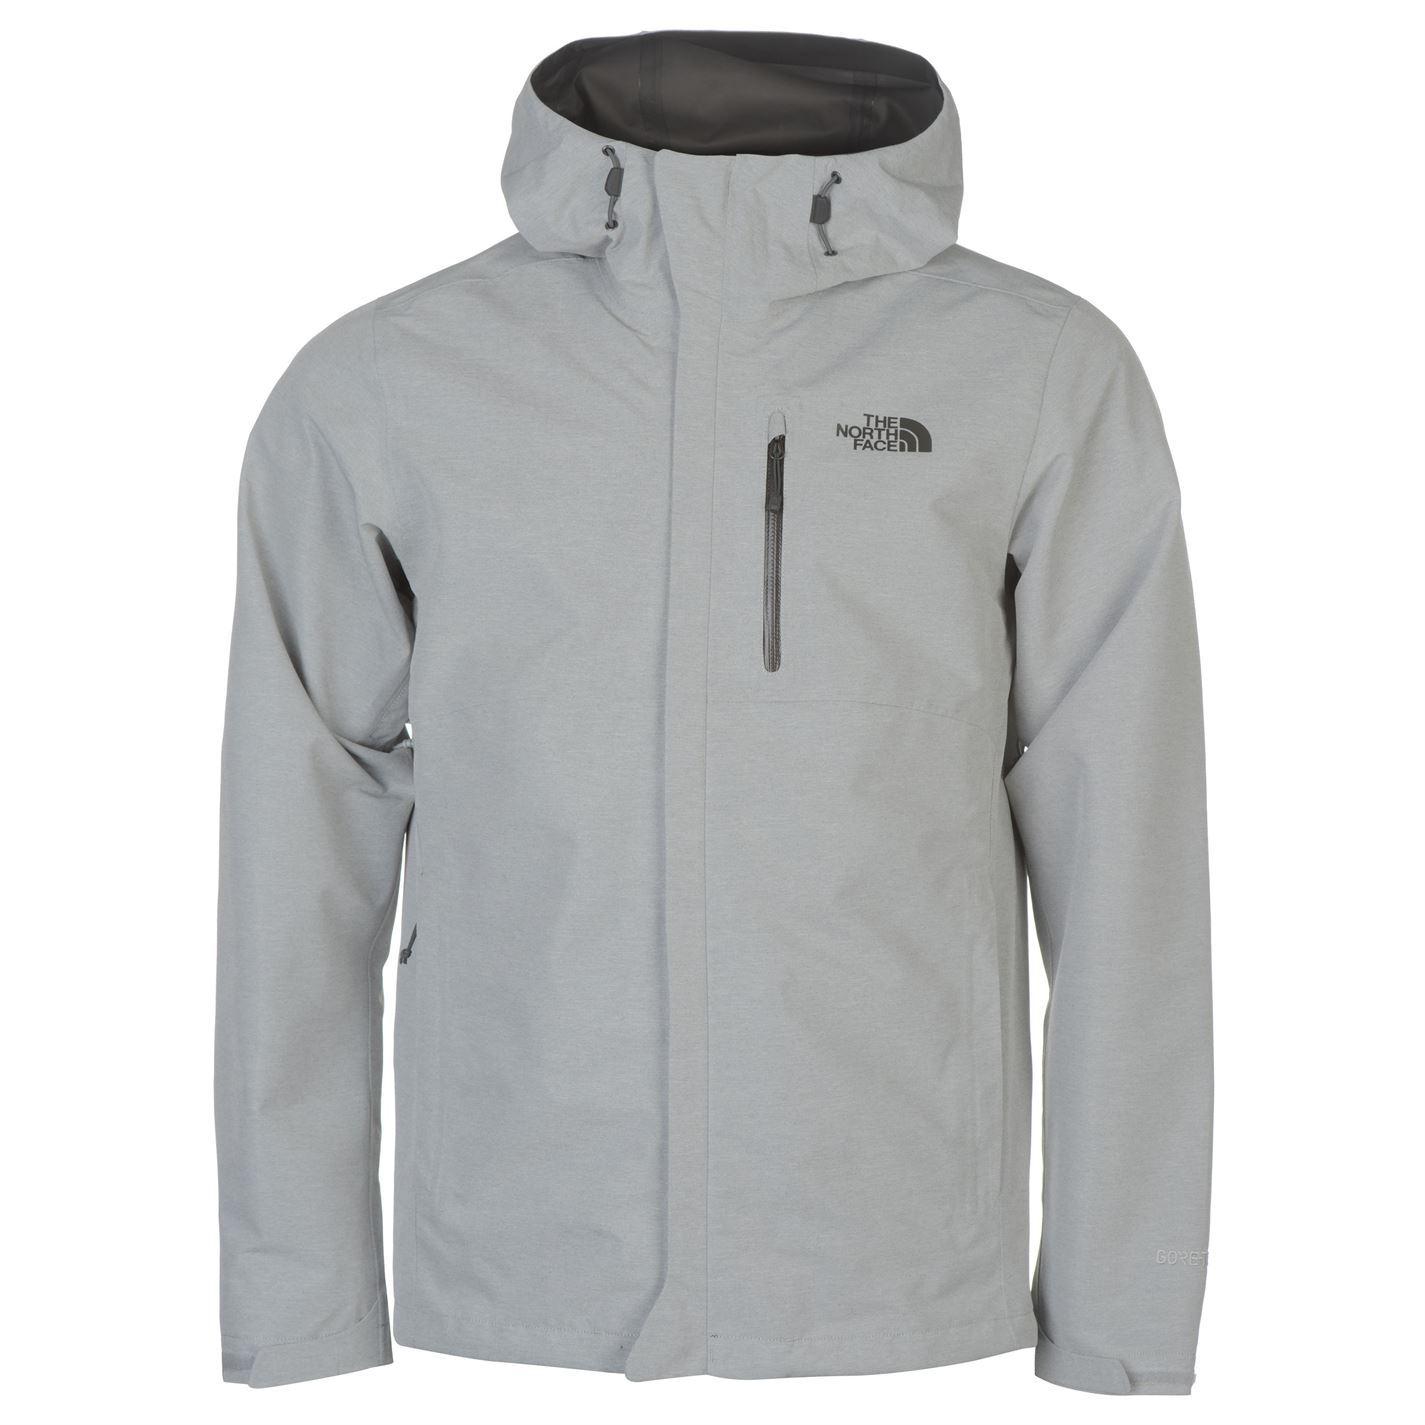 d960986e8947 Details about The North Face Mens Dryzzle Gore Tex Jacket Waterproof Coat  Top